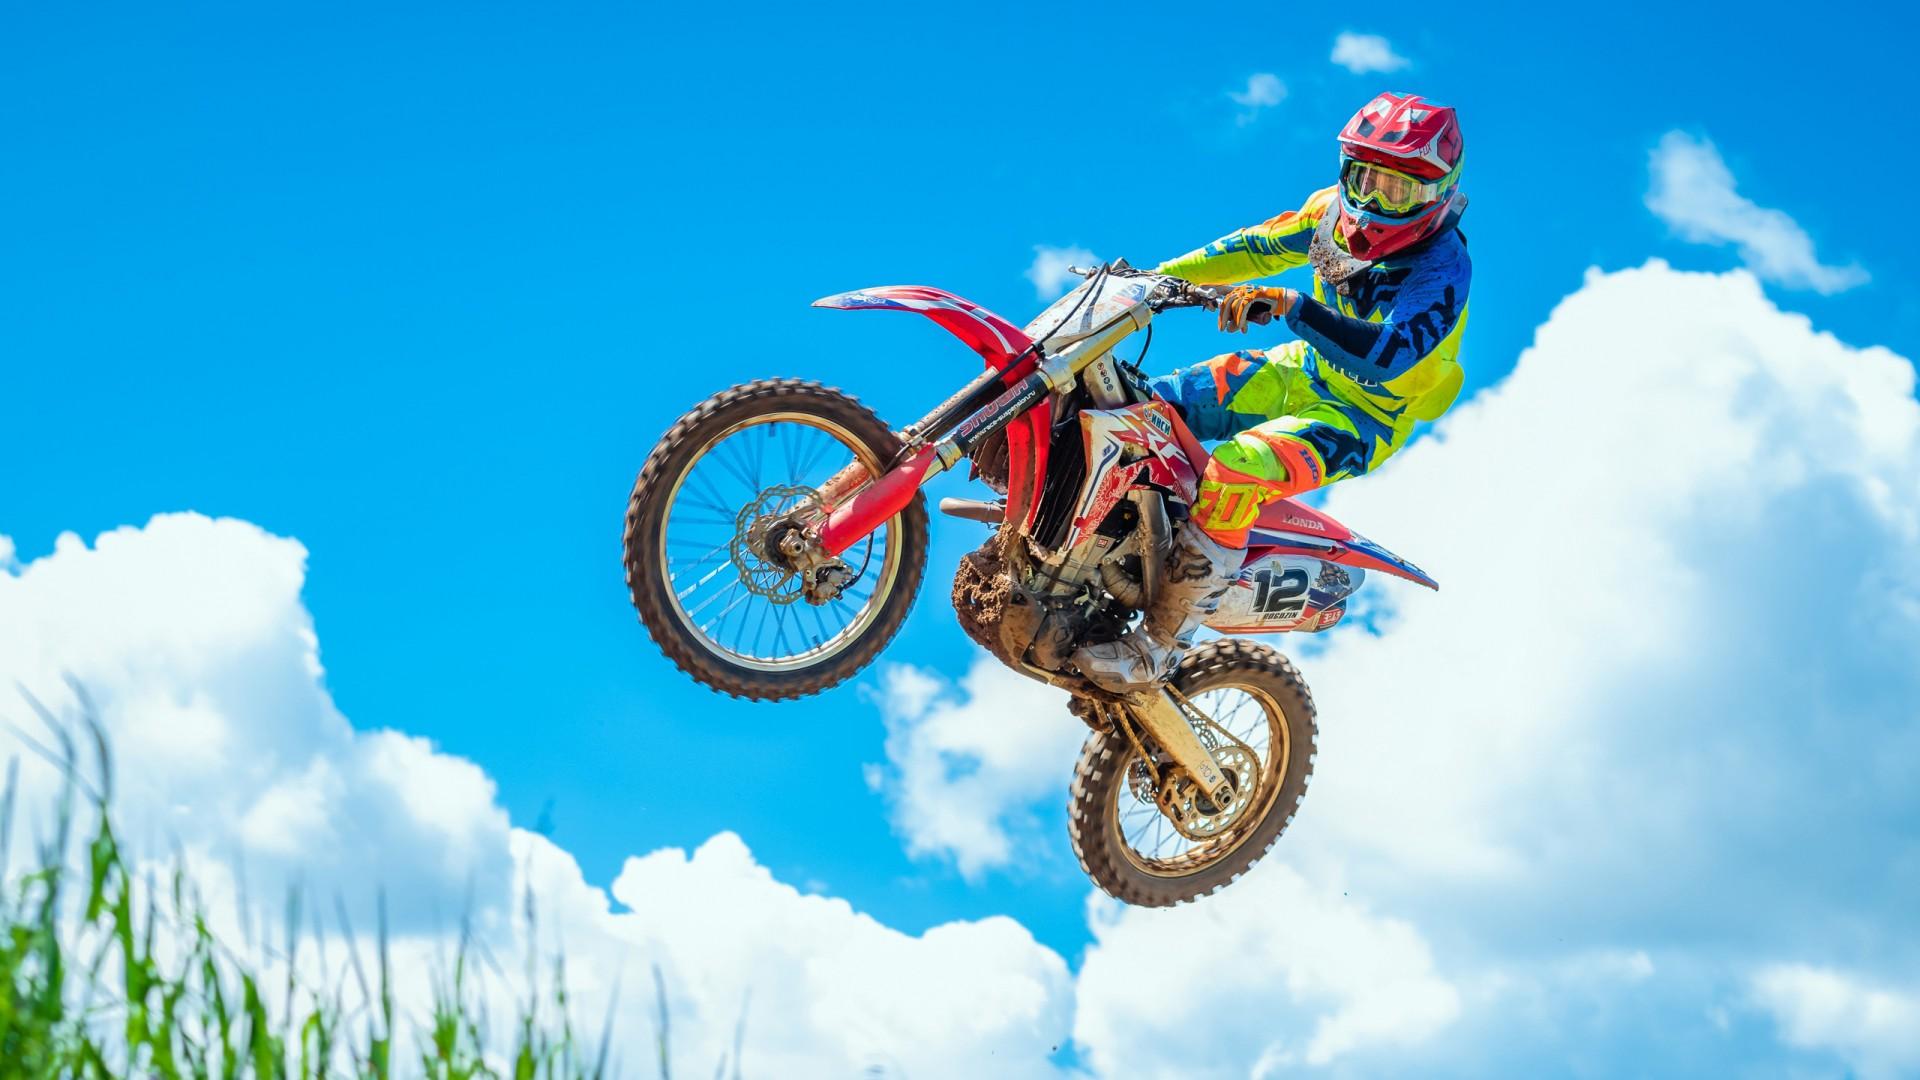 Ktm Duke Hd Wallpapers Motocross Biker Stunts Wallpapers Hd Wallpapers Id 26039